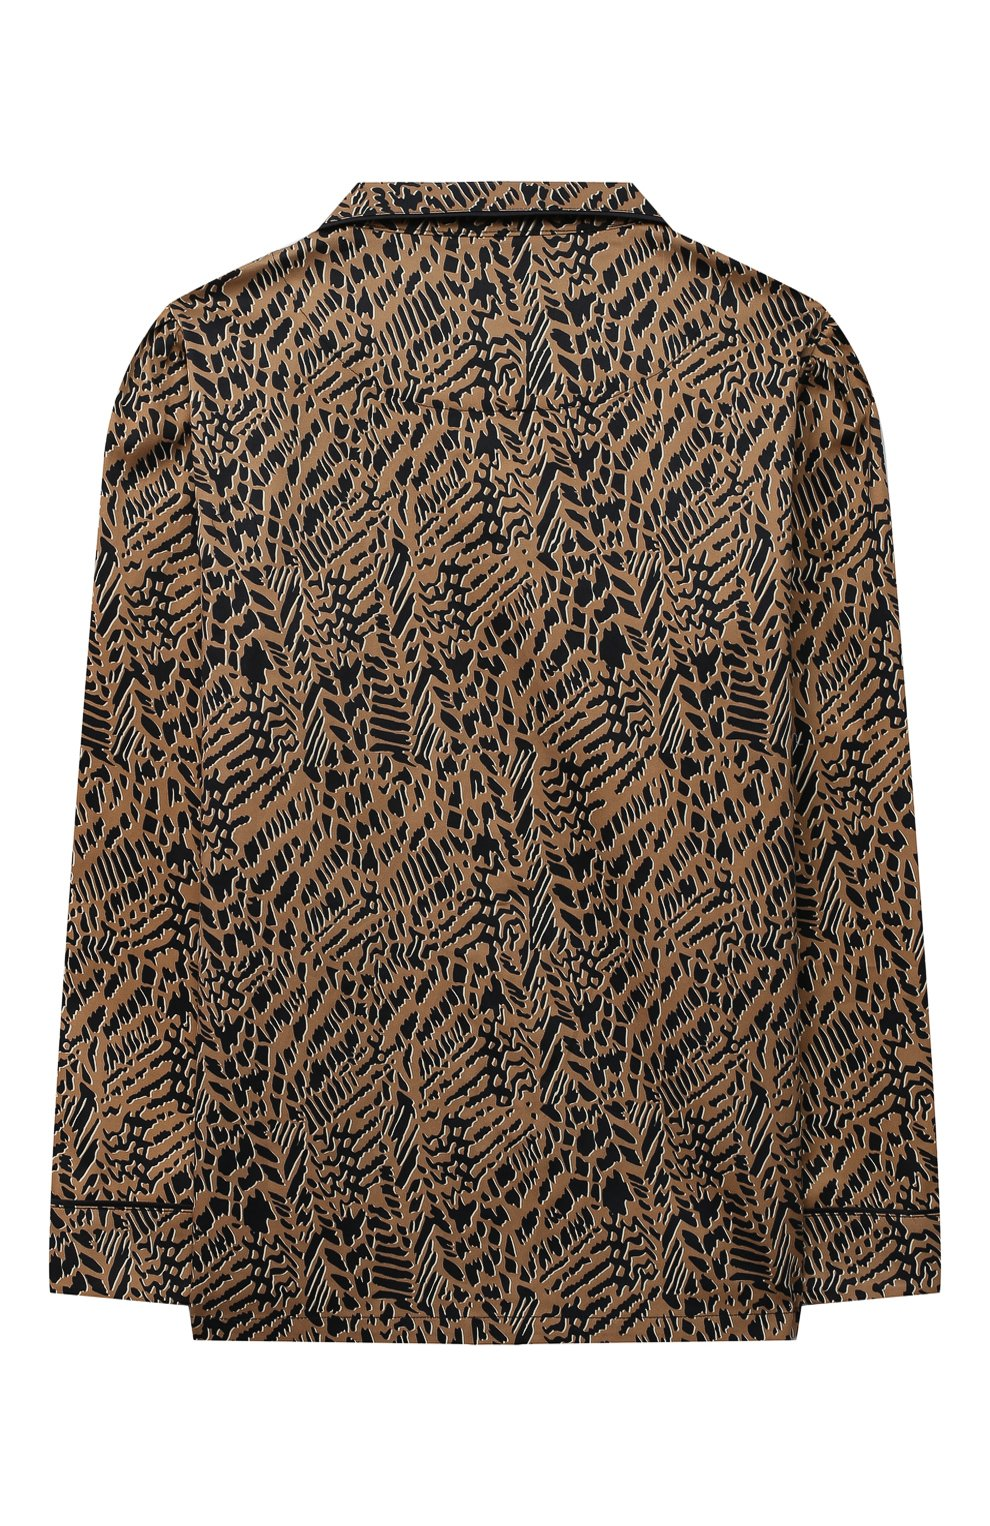 Детская хлопковая пижама LITTLE YOLKE леопардового цвета, арт. SS21-12C-AN-DI/9-12Y | Фото 3